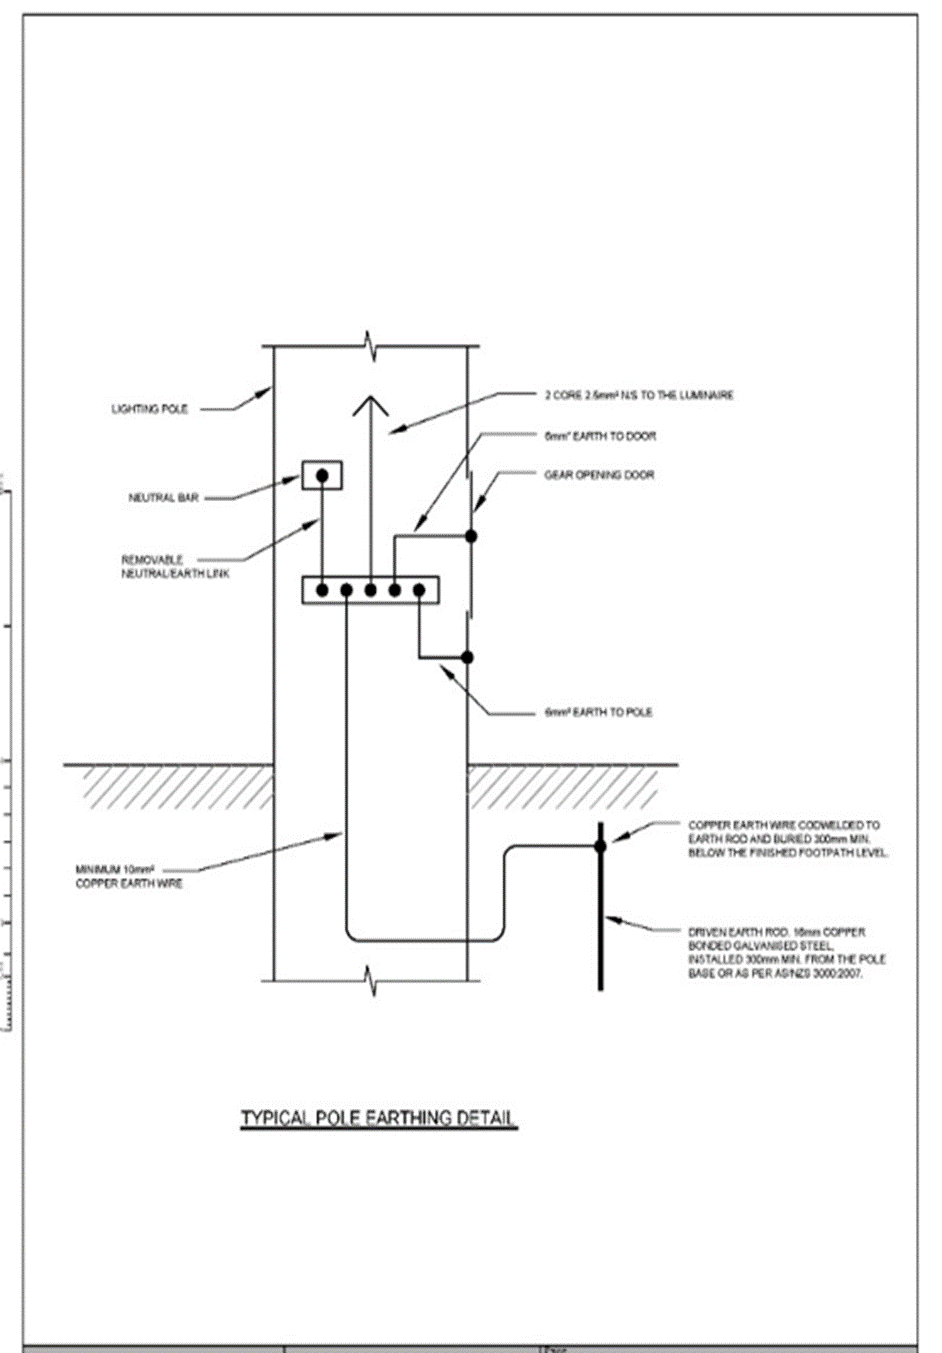 column earthing detail